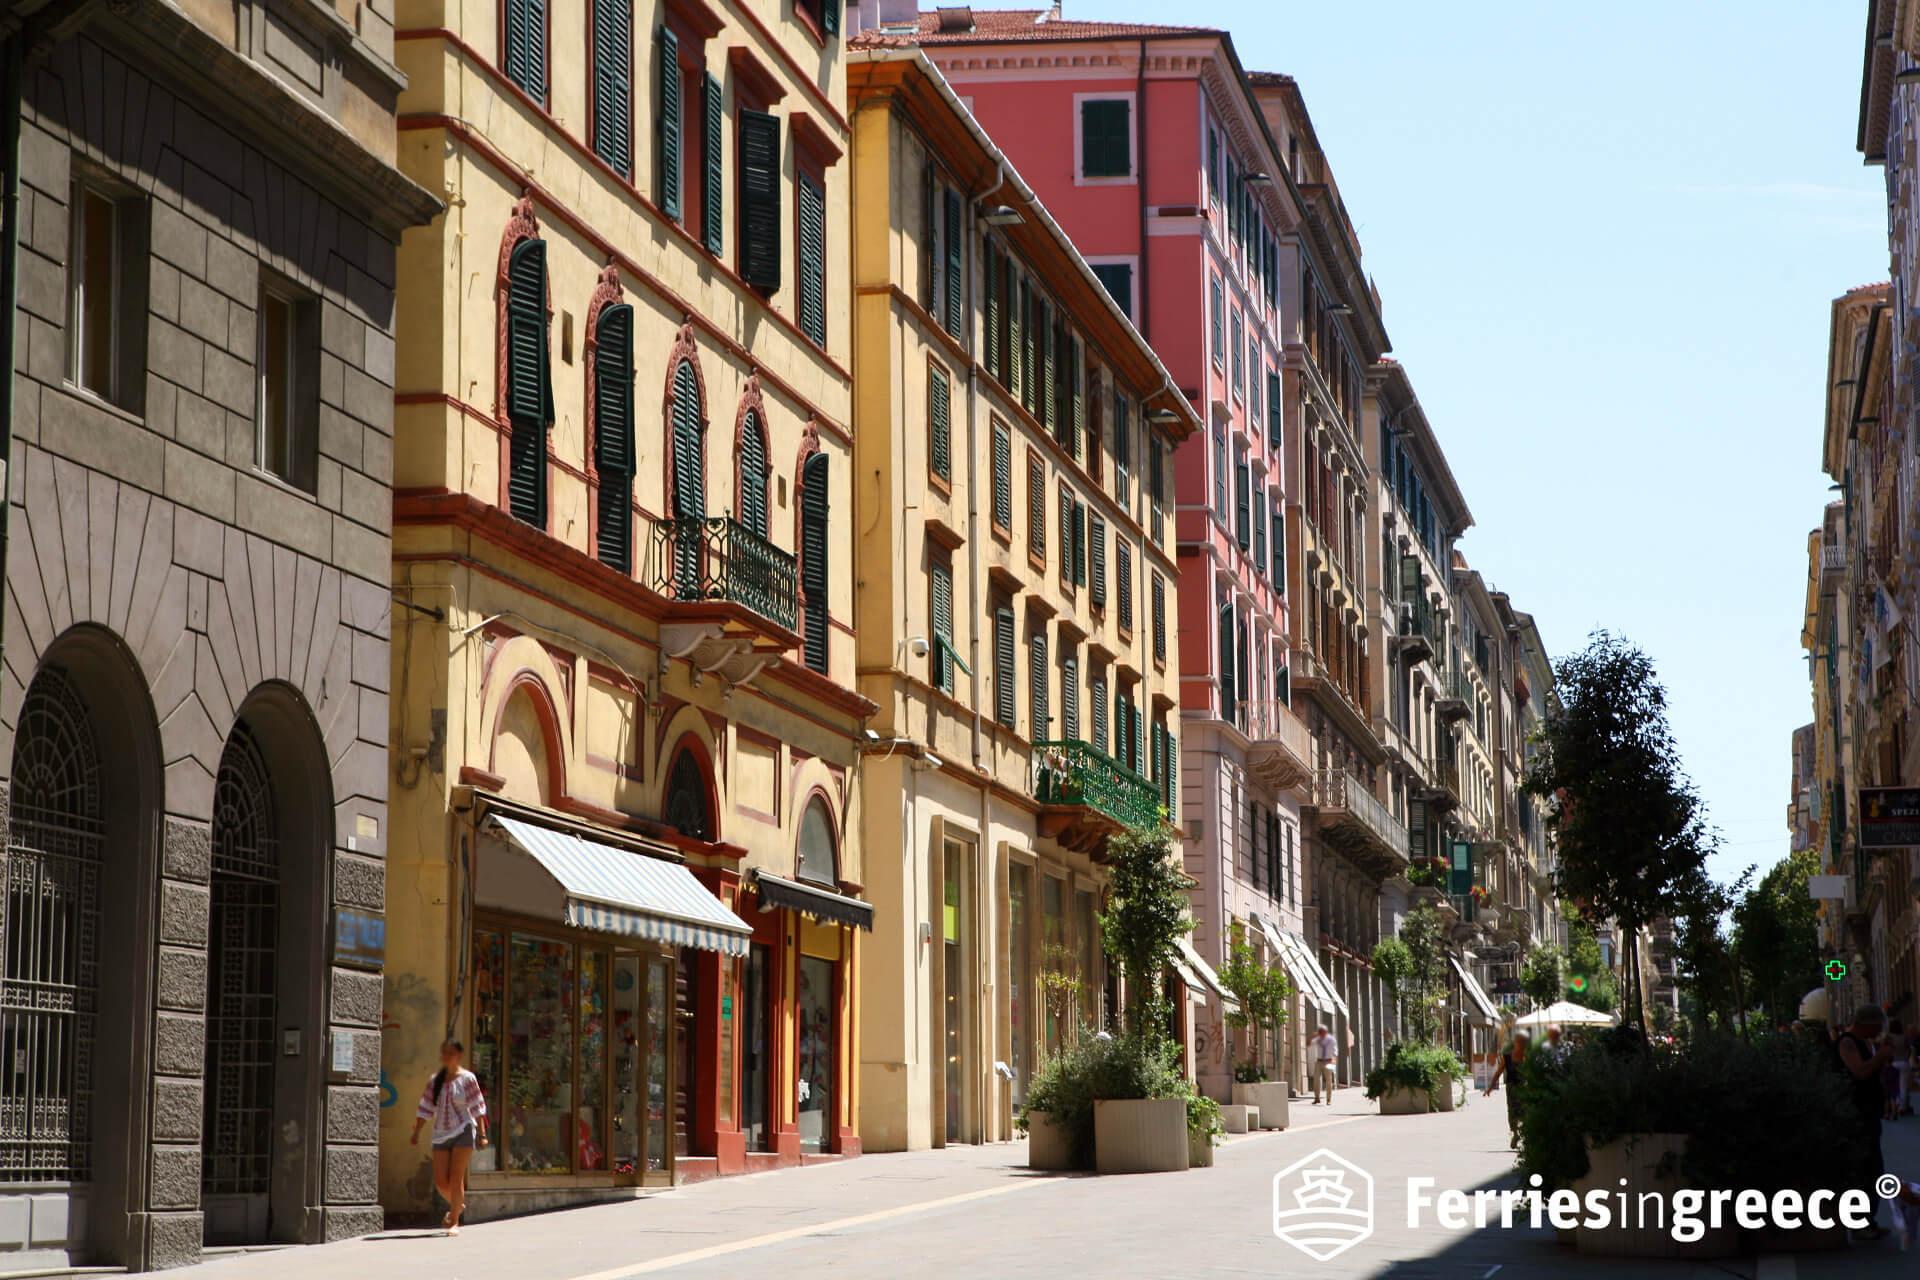 ancona town